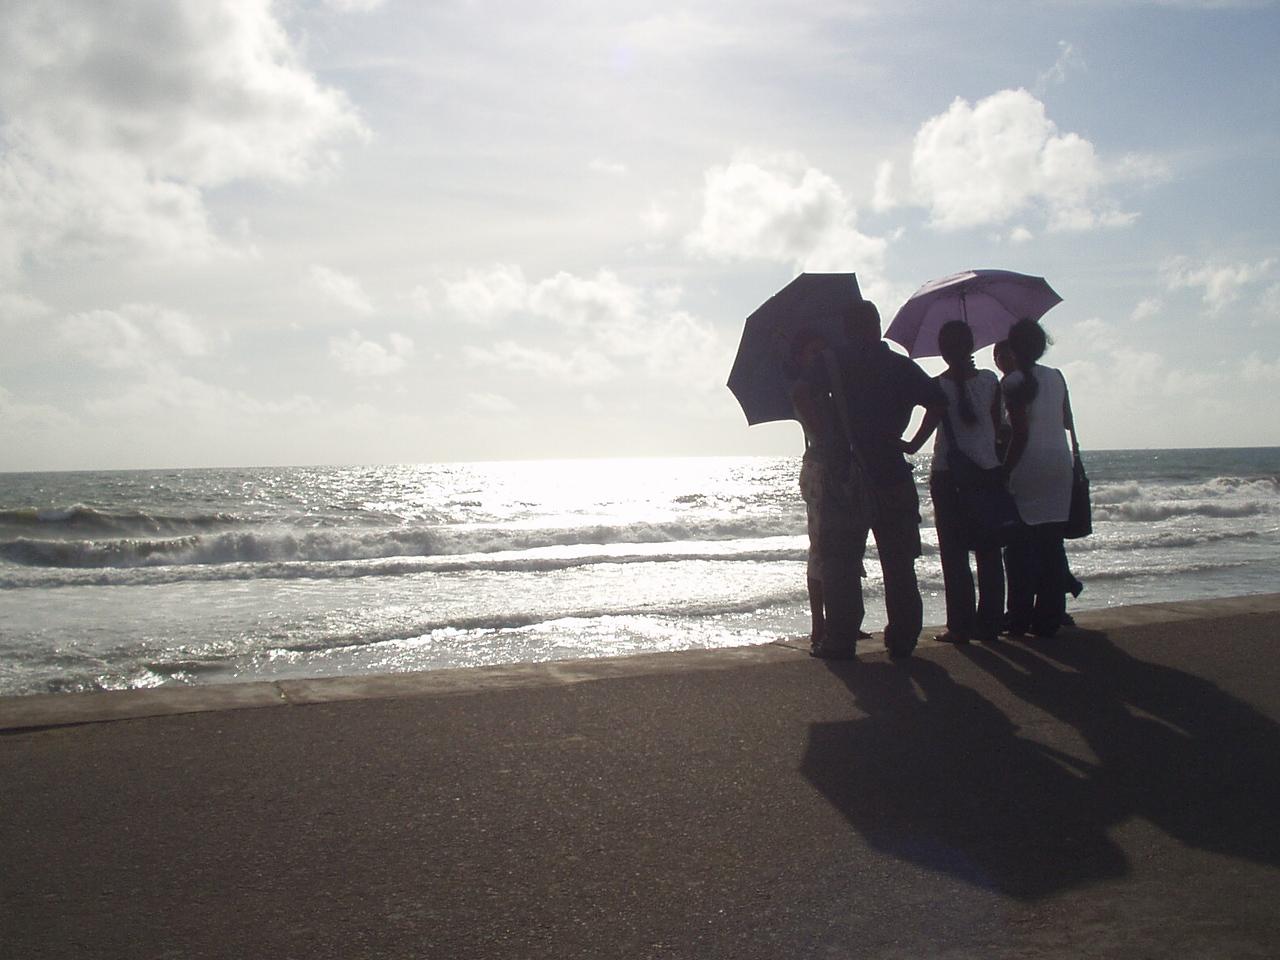 colombo umbrellas